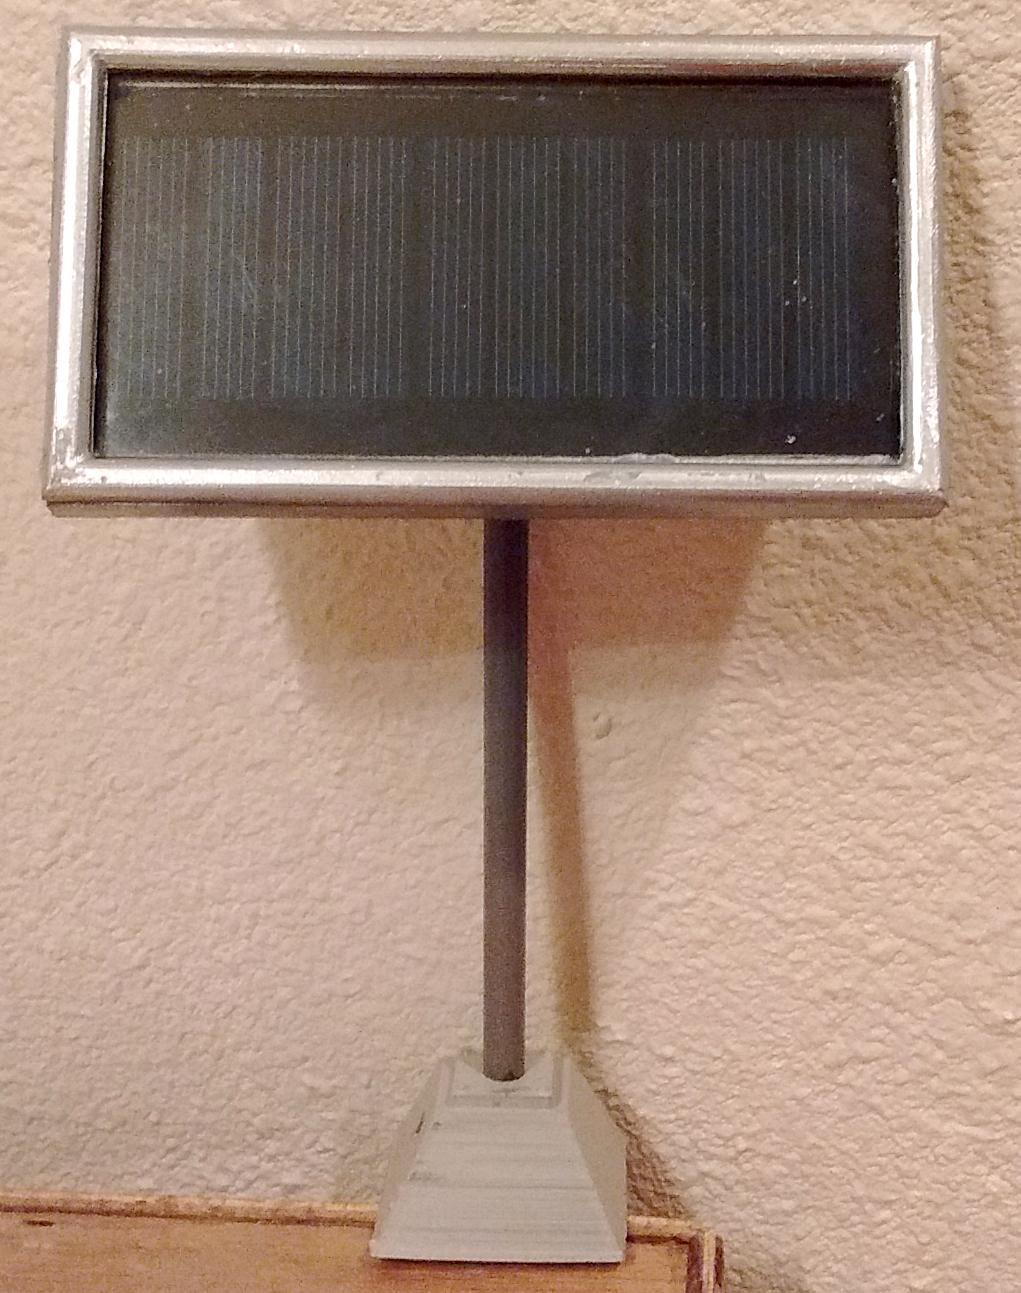 12_SolarPanel